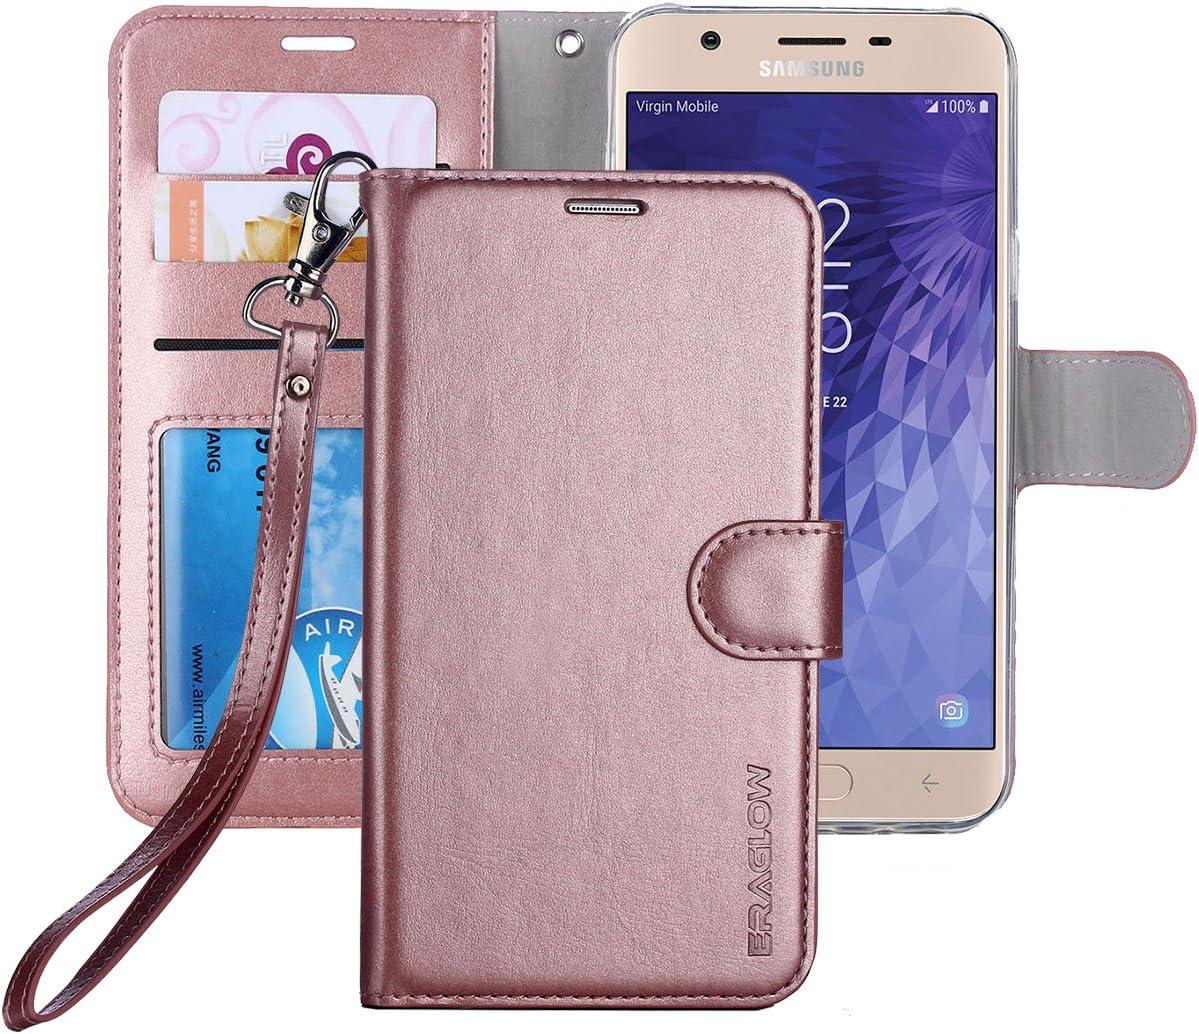 Galaxy J7 2018 Case/J7 V 2nd case/J7 Refine/J7 Star/J7 Aero/J7 Crown/J7 Top/J7 Aura/J7 Eon Case, ERAGLOW Luxury PU Leather Wallet Flip Protective Case Cover for Samsung Galaxy J737 (Rose Gold)